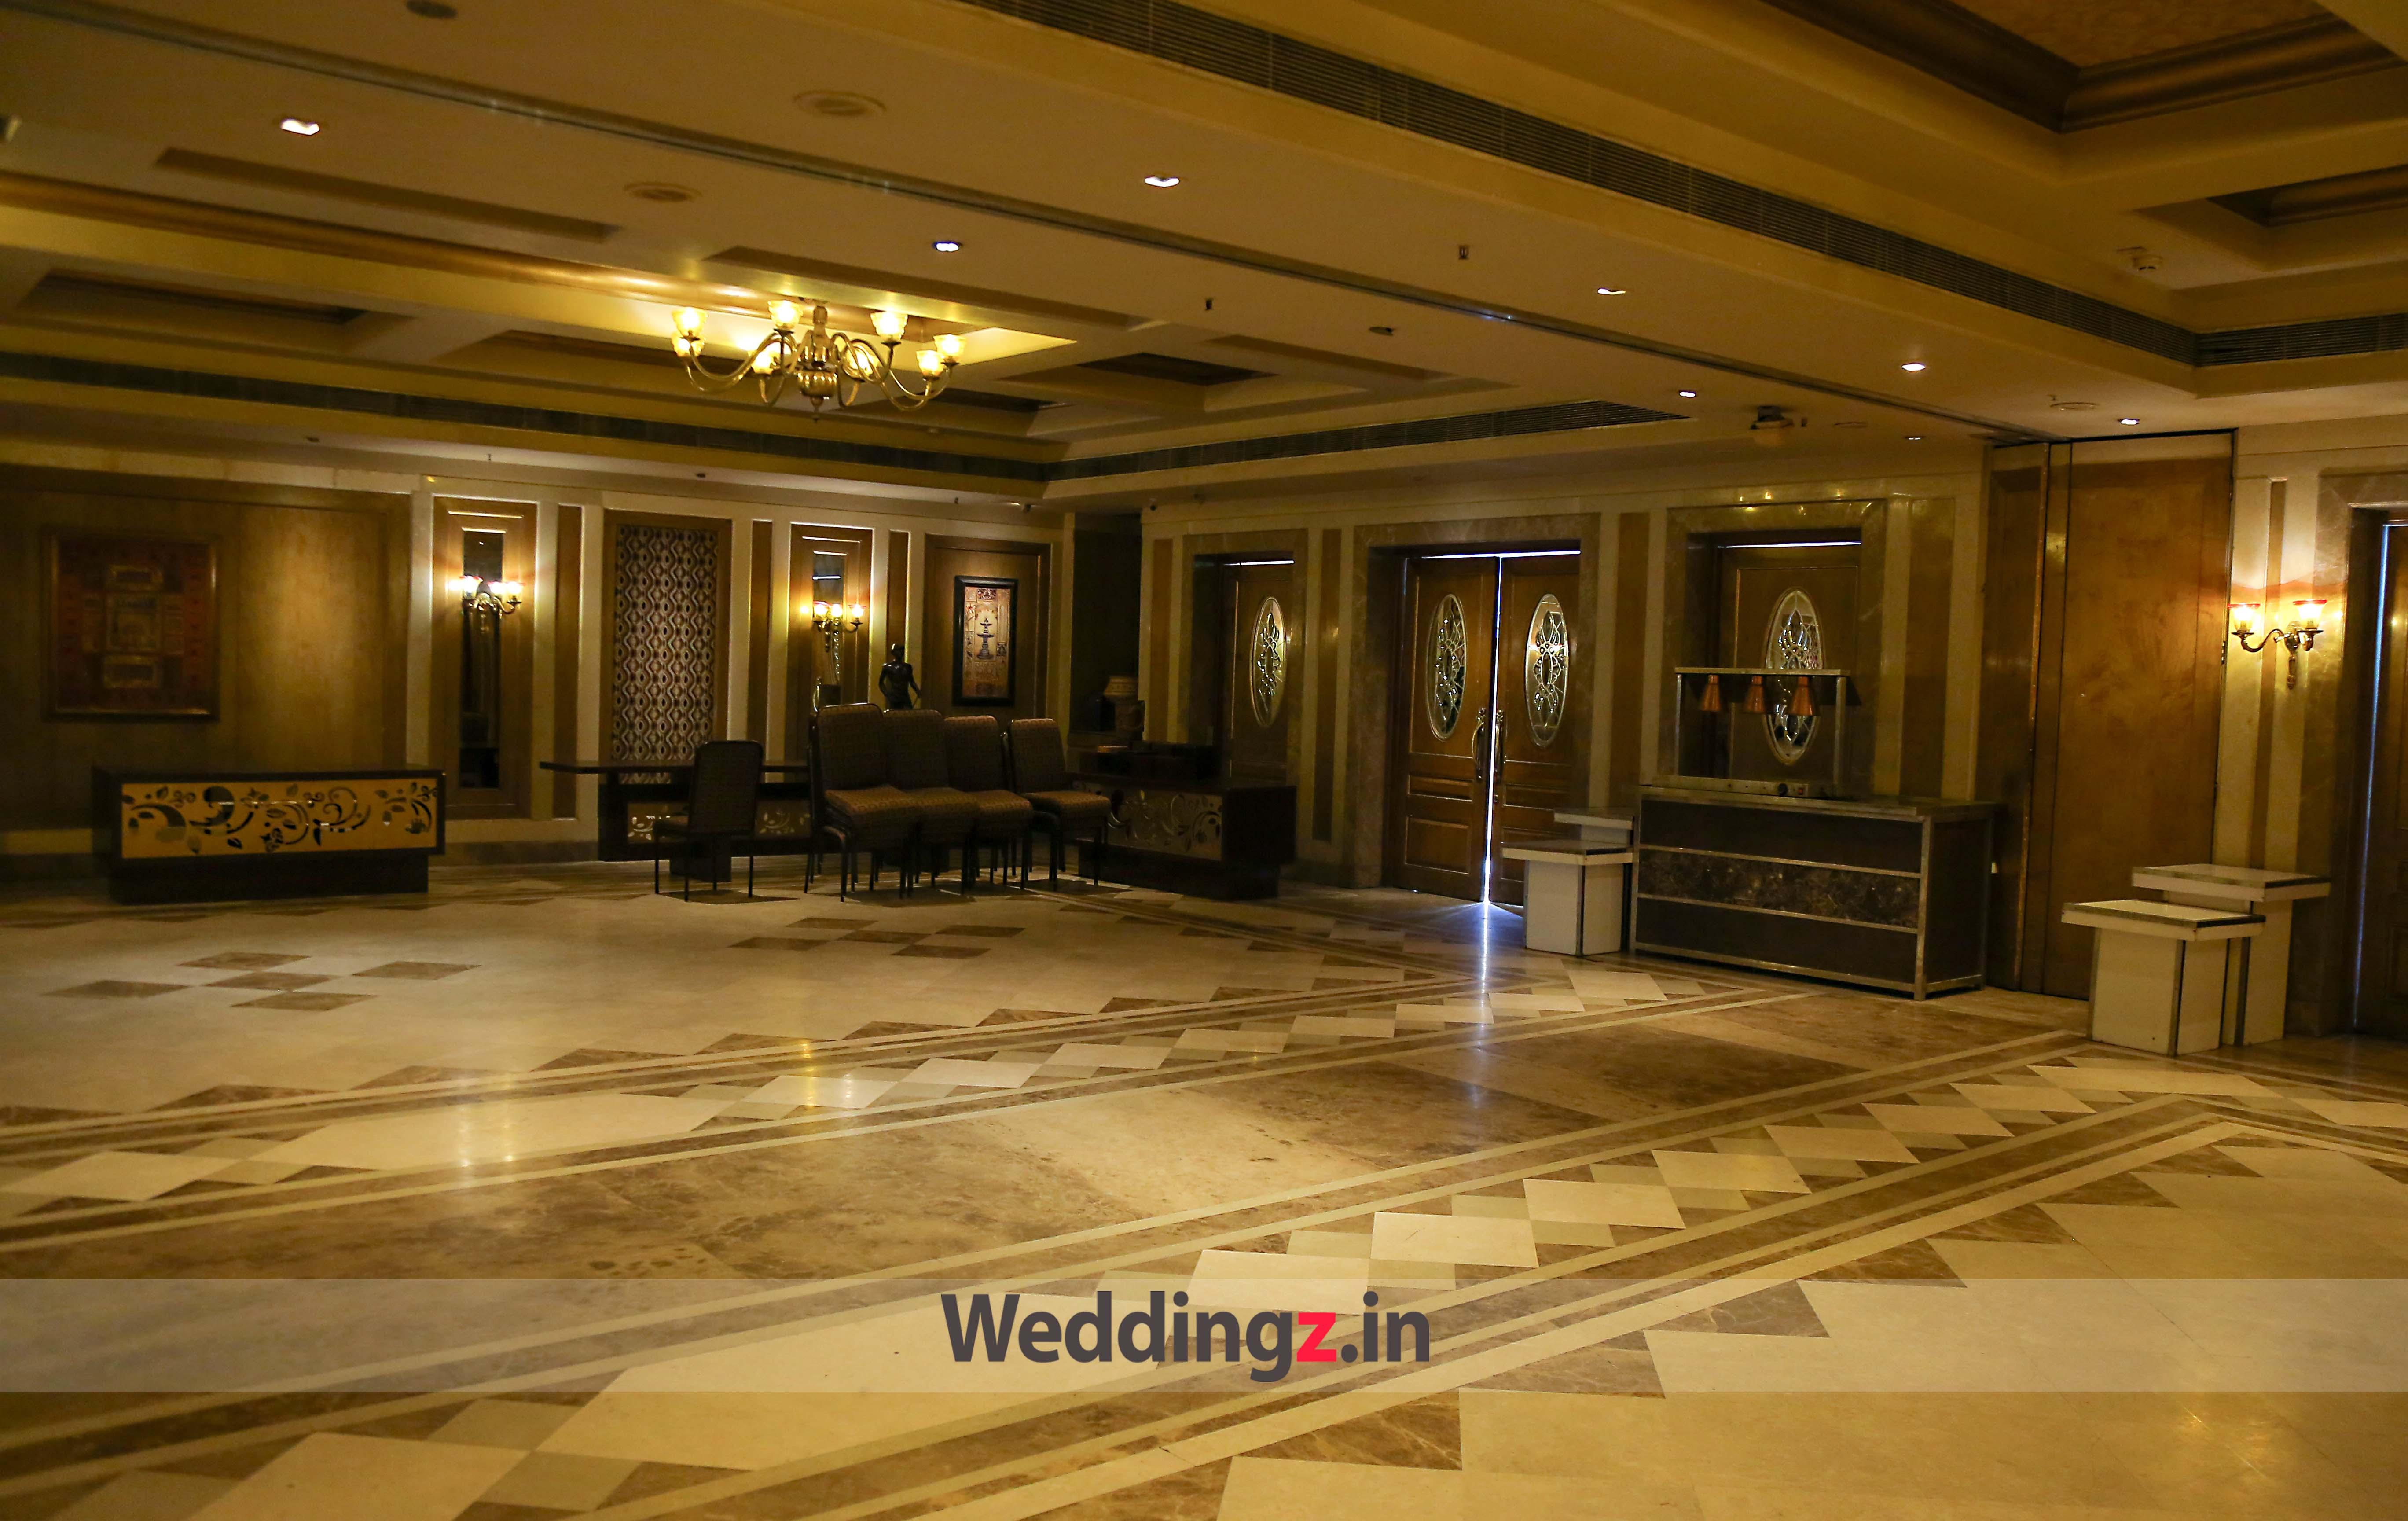 Tivoli Garden Resort Hotel Chattarpur Photos | Tivoli Garden Resort ...